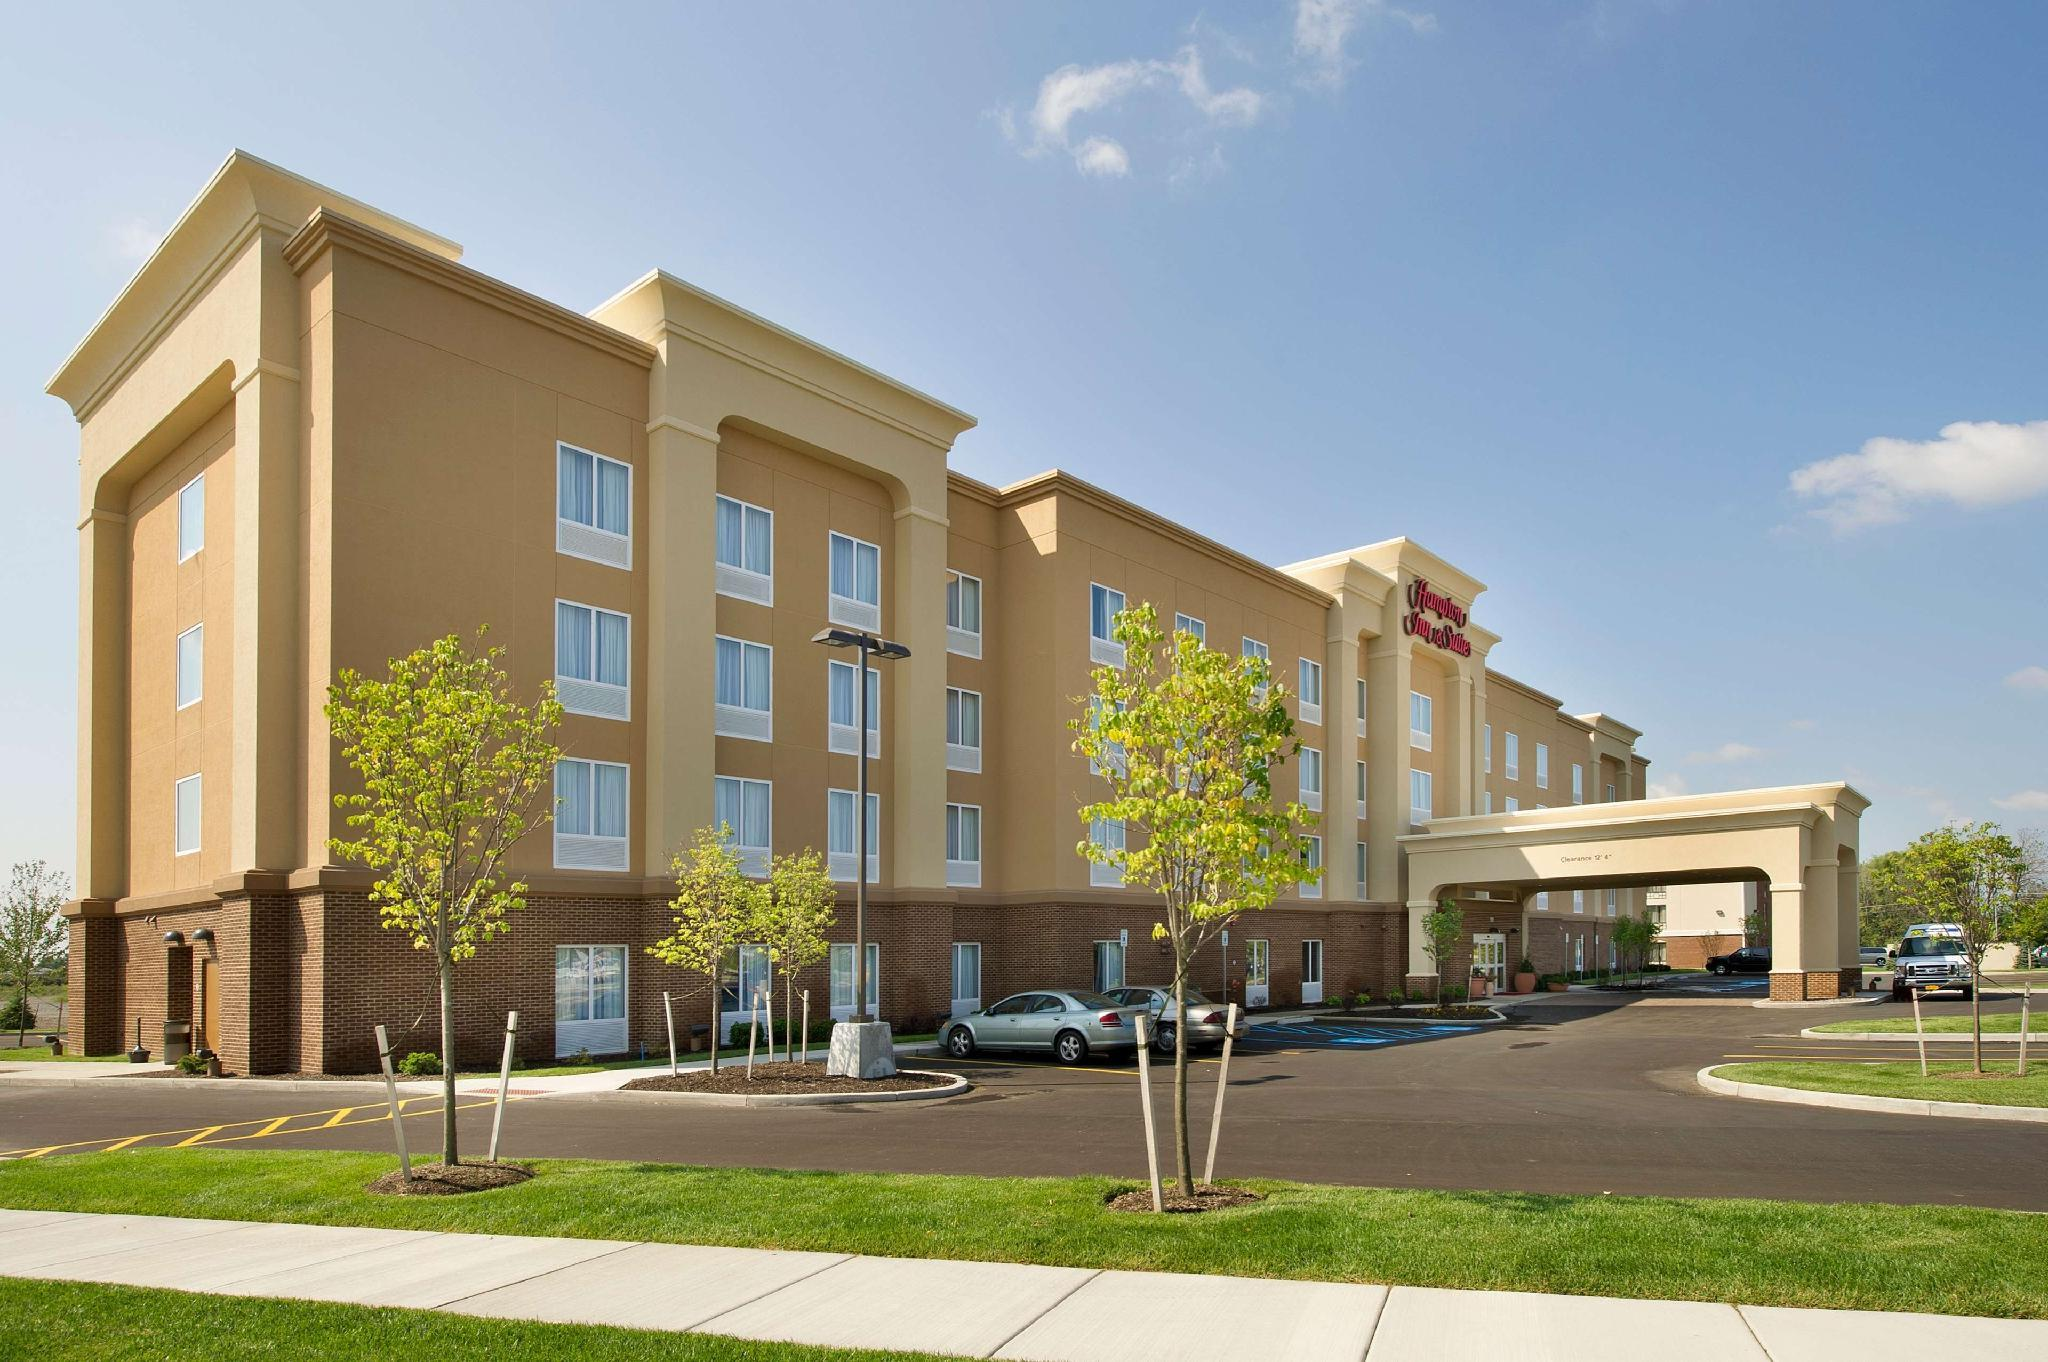 Hampton Inn And Suites Buffalo Airport